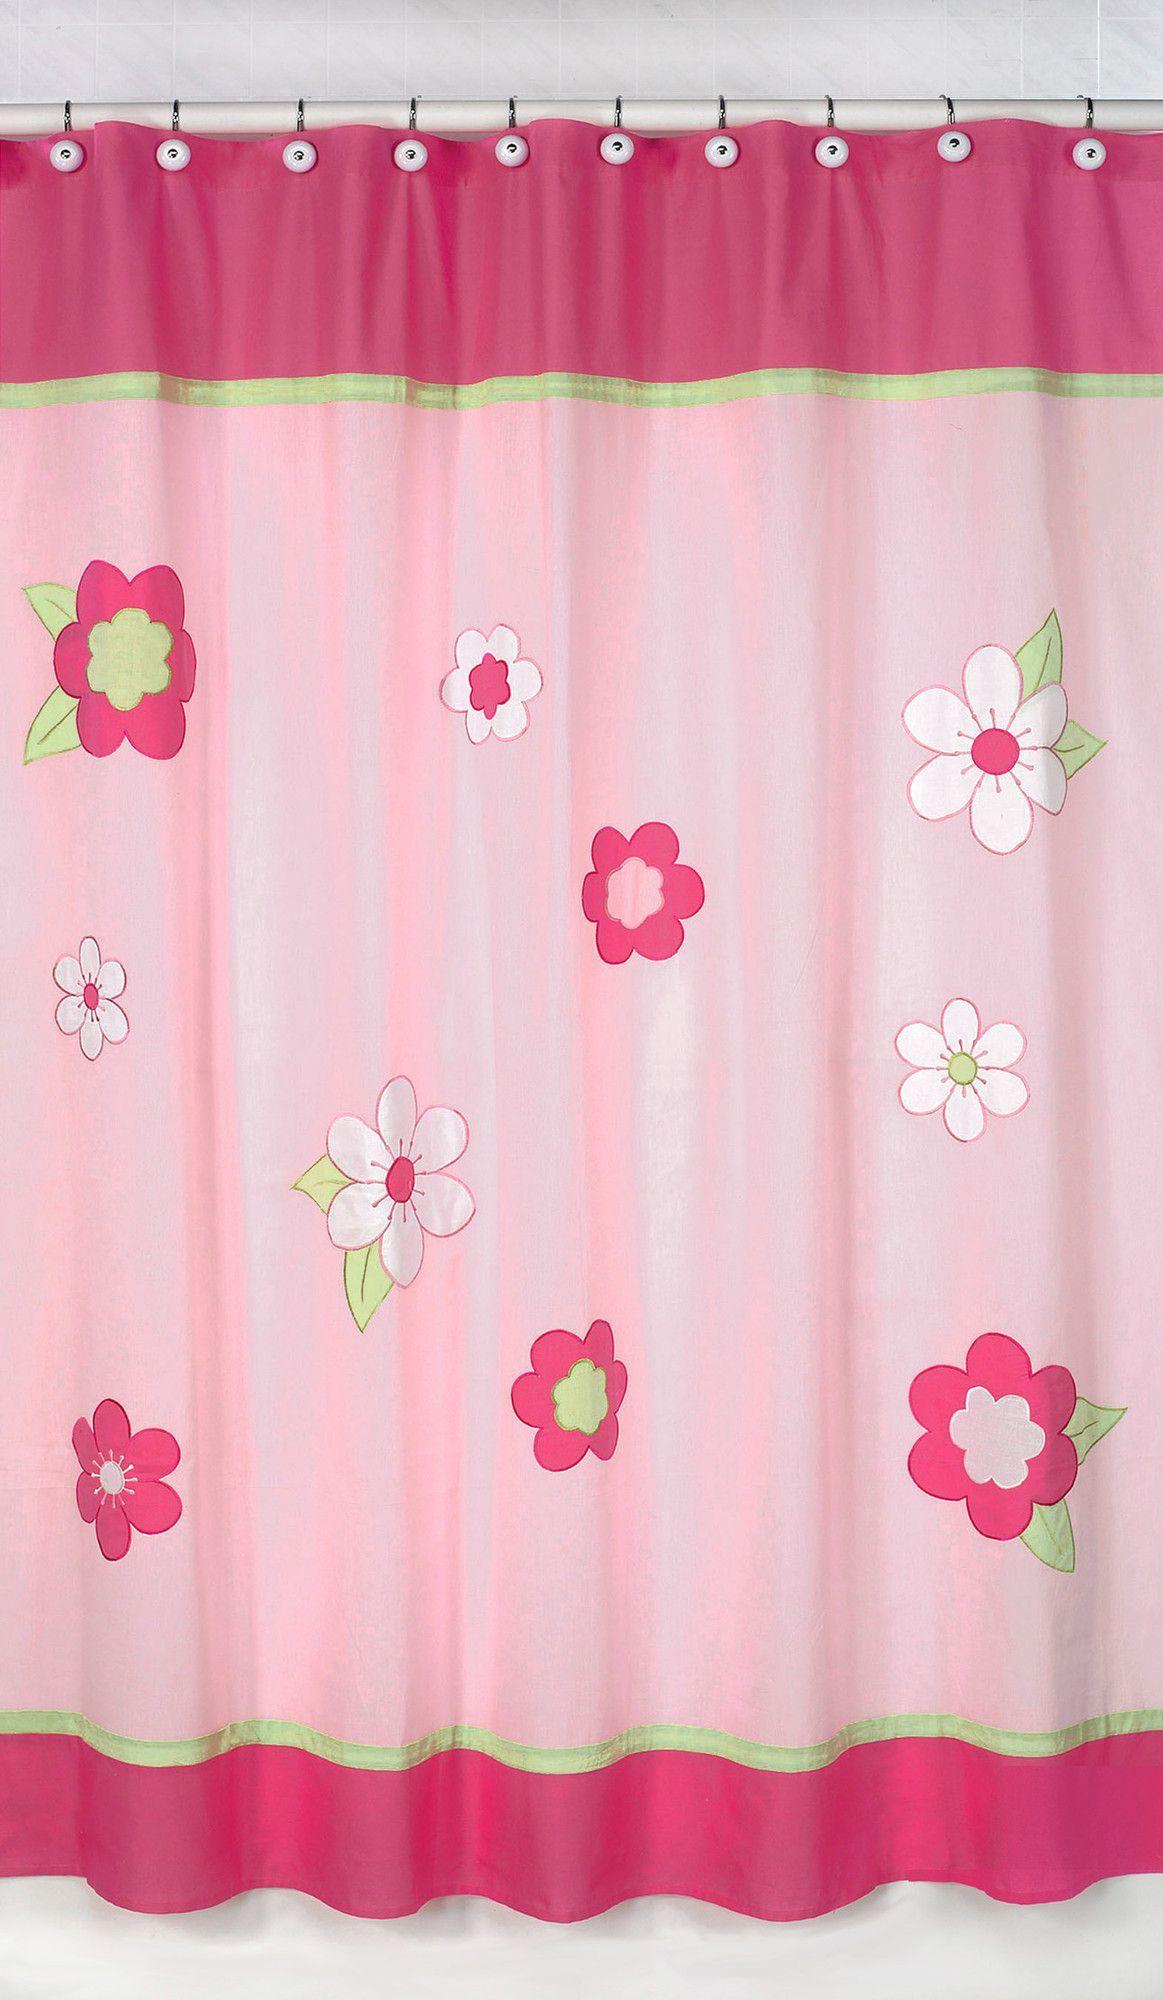 Flower Pink and Green Cotton Shower Curtain | Milana | Pinterest ...